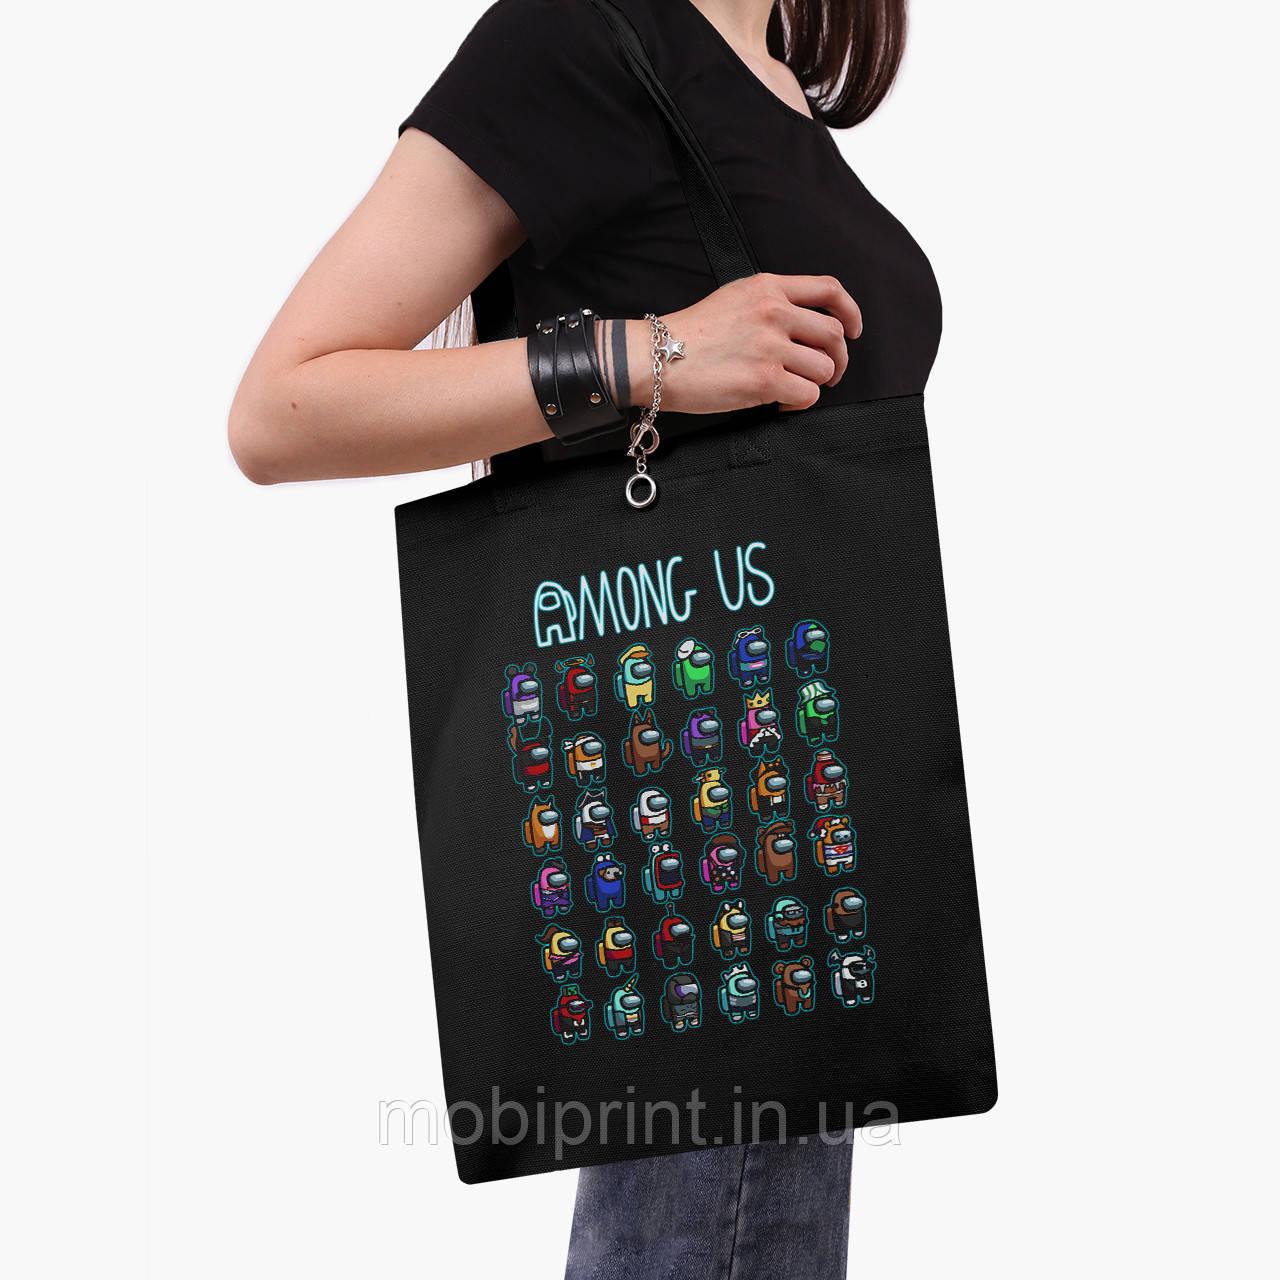 Еко сумка шоппер чорна Амонг Ас (Among Us) (9227-2587-2) 41*35 см